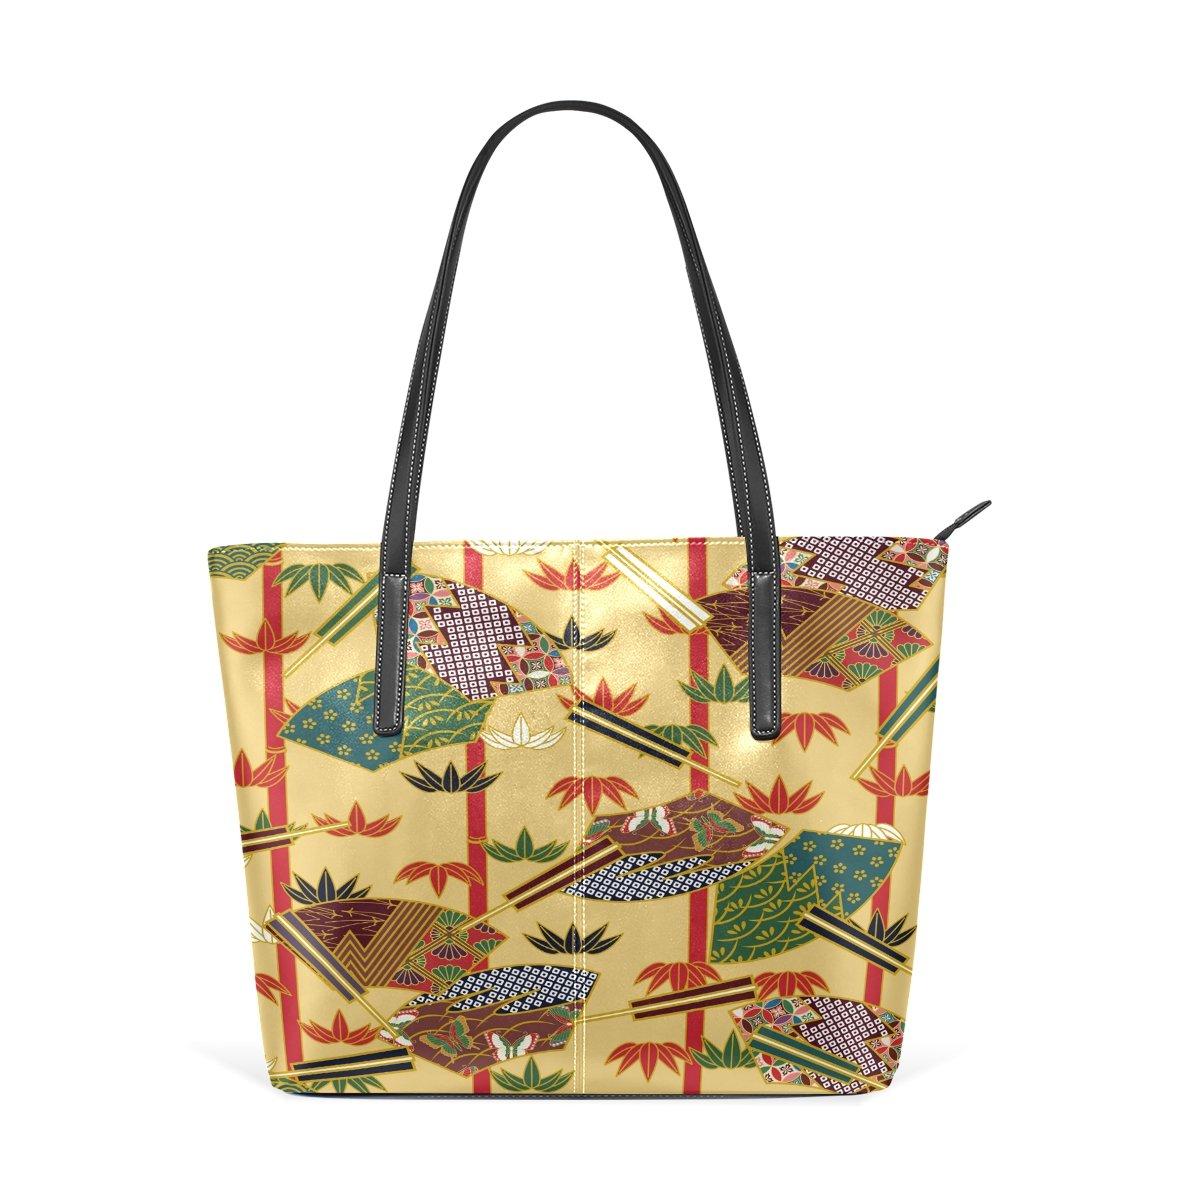 Womens Leather Top Handle Shoulder Handbag Bamboo Large Work Tote Bag